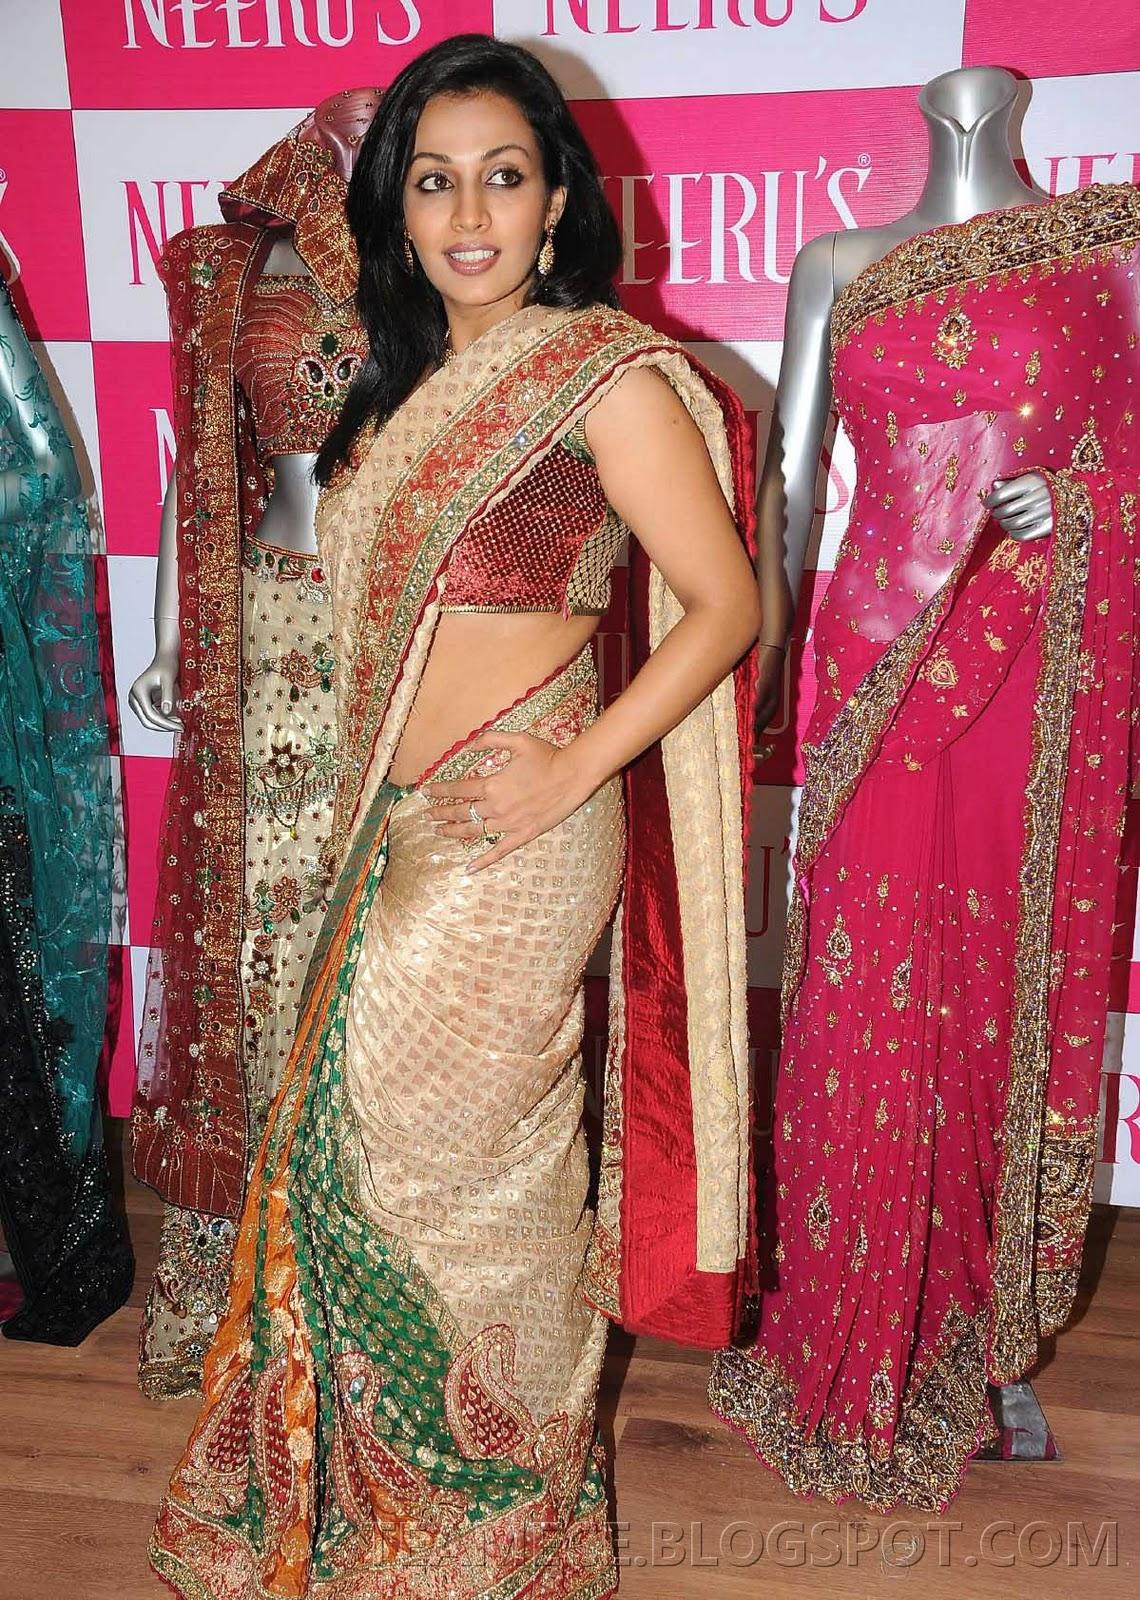 Telugu Xxx Bommalu Billeder Asha Saini Ny Hot Fast Photoall-6464